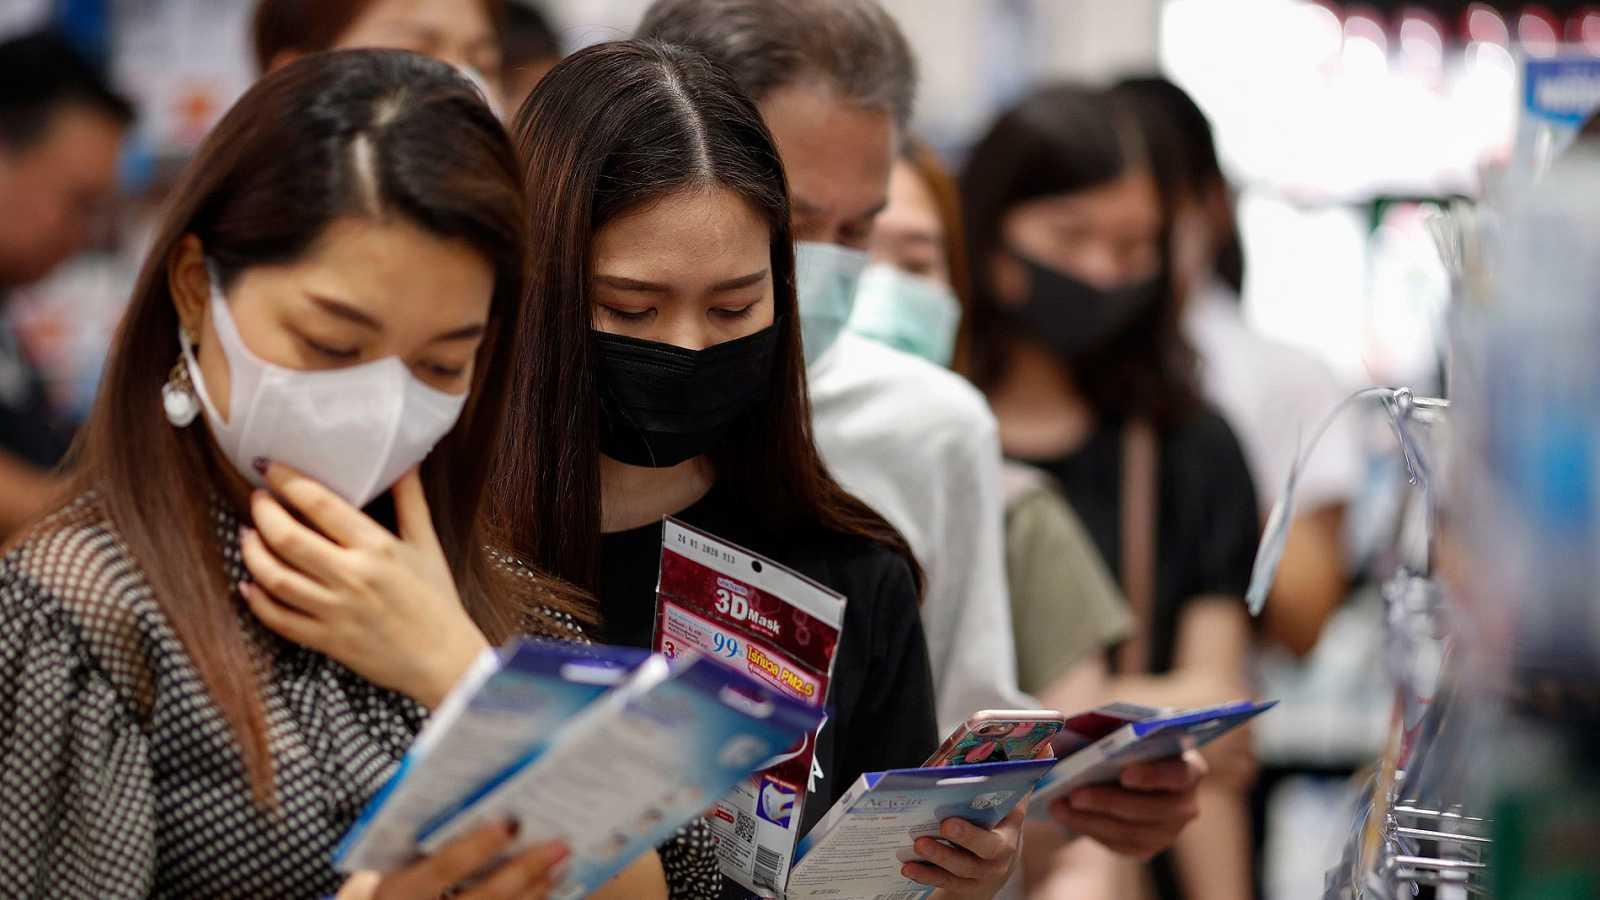 Un grupo de turistas chinos compra máscaras protectoras en un supermercado de Bangkok, Tailandia.